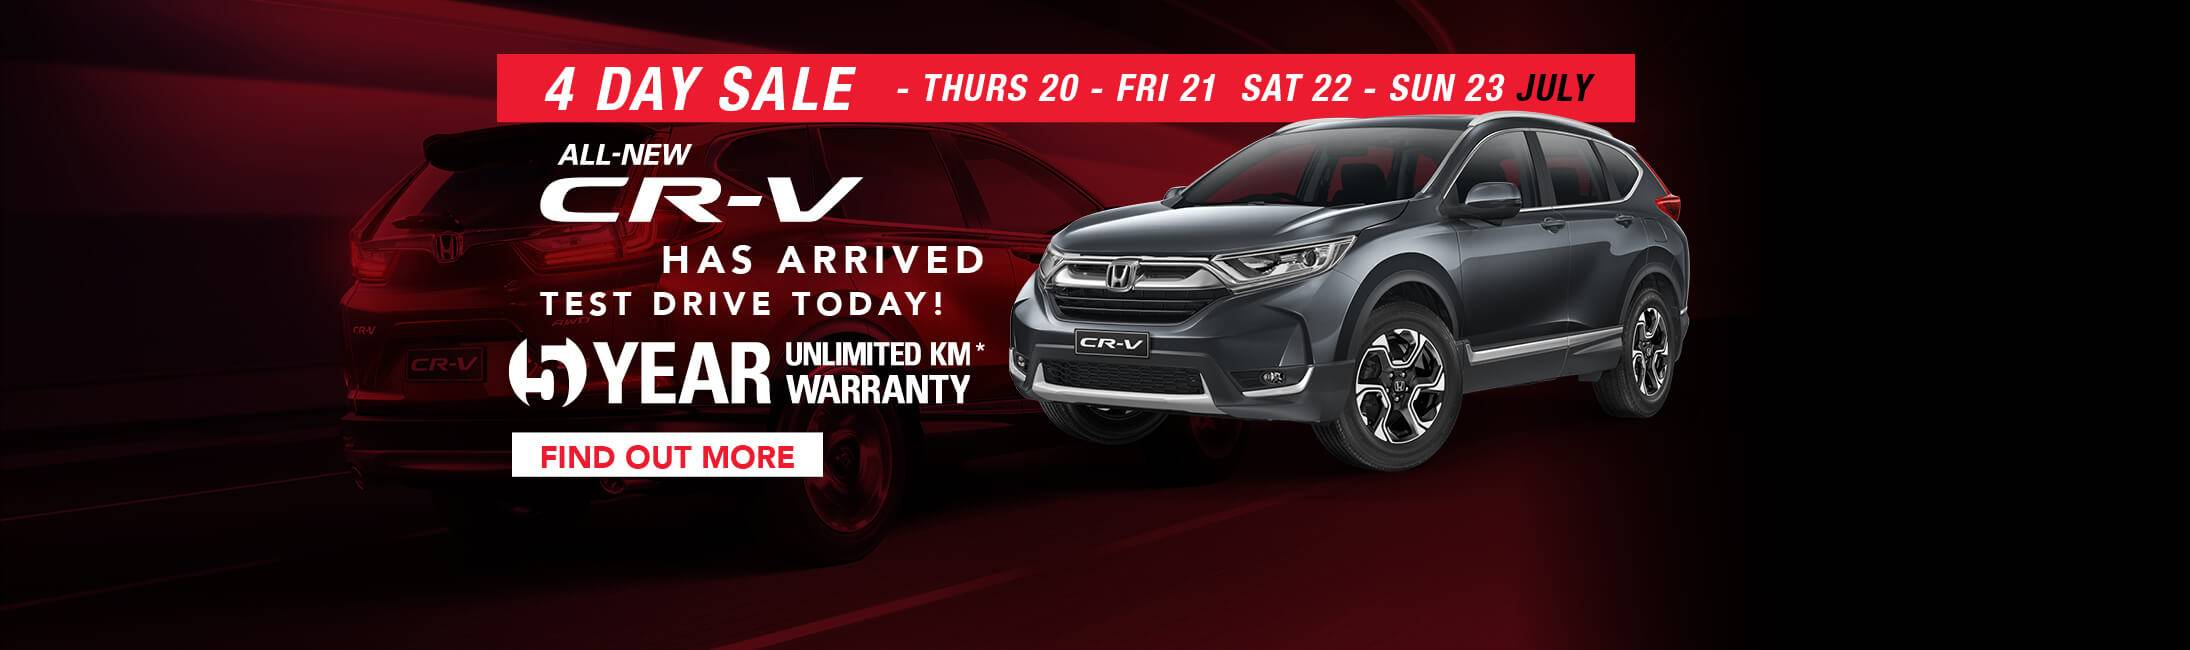 Western Highway Honda - 4 Day Sale